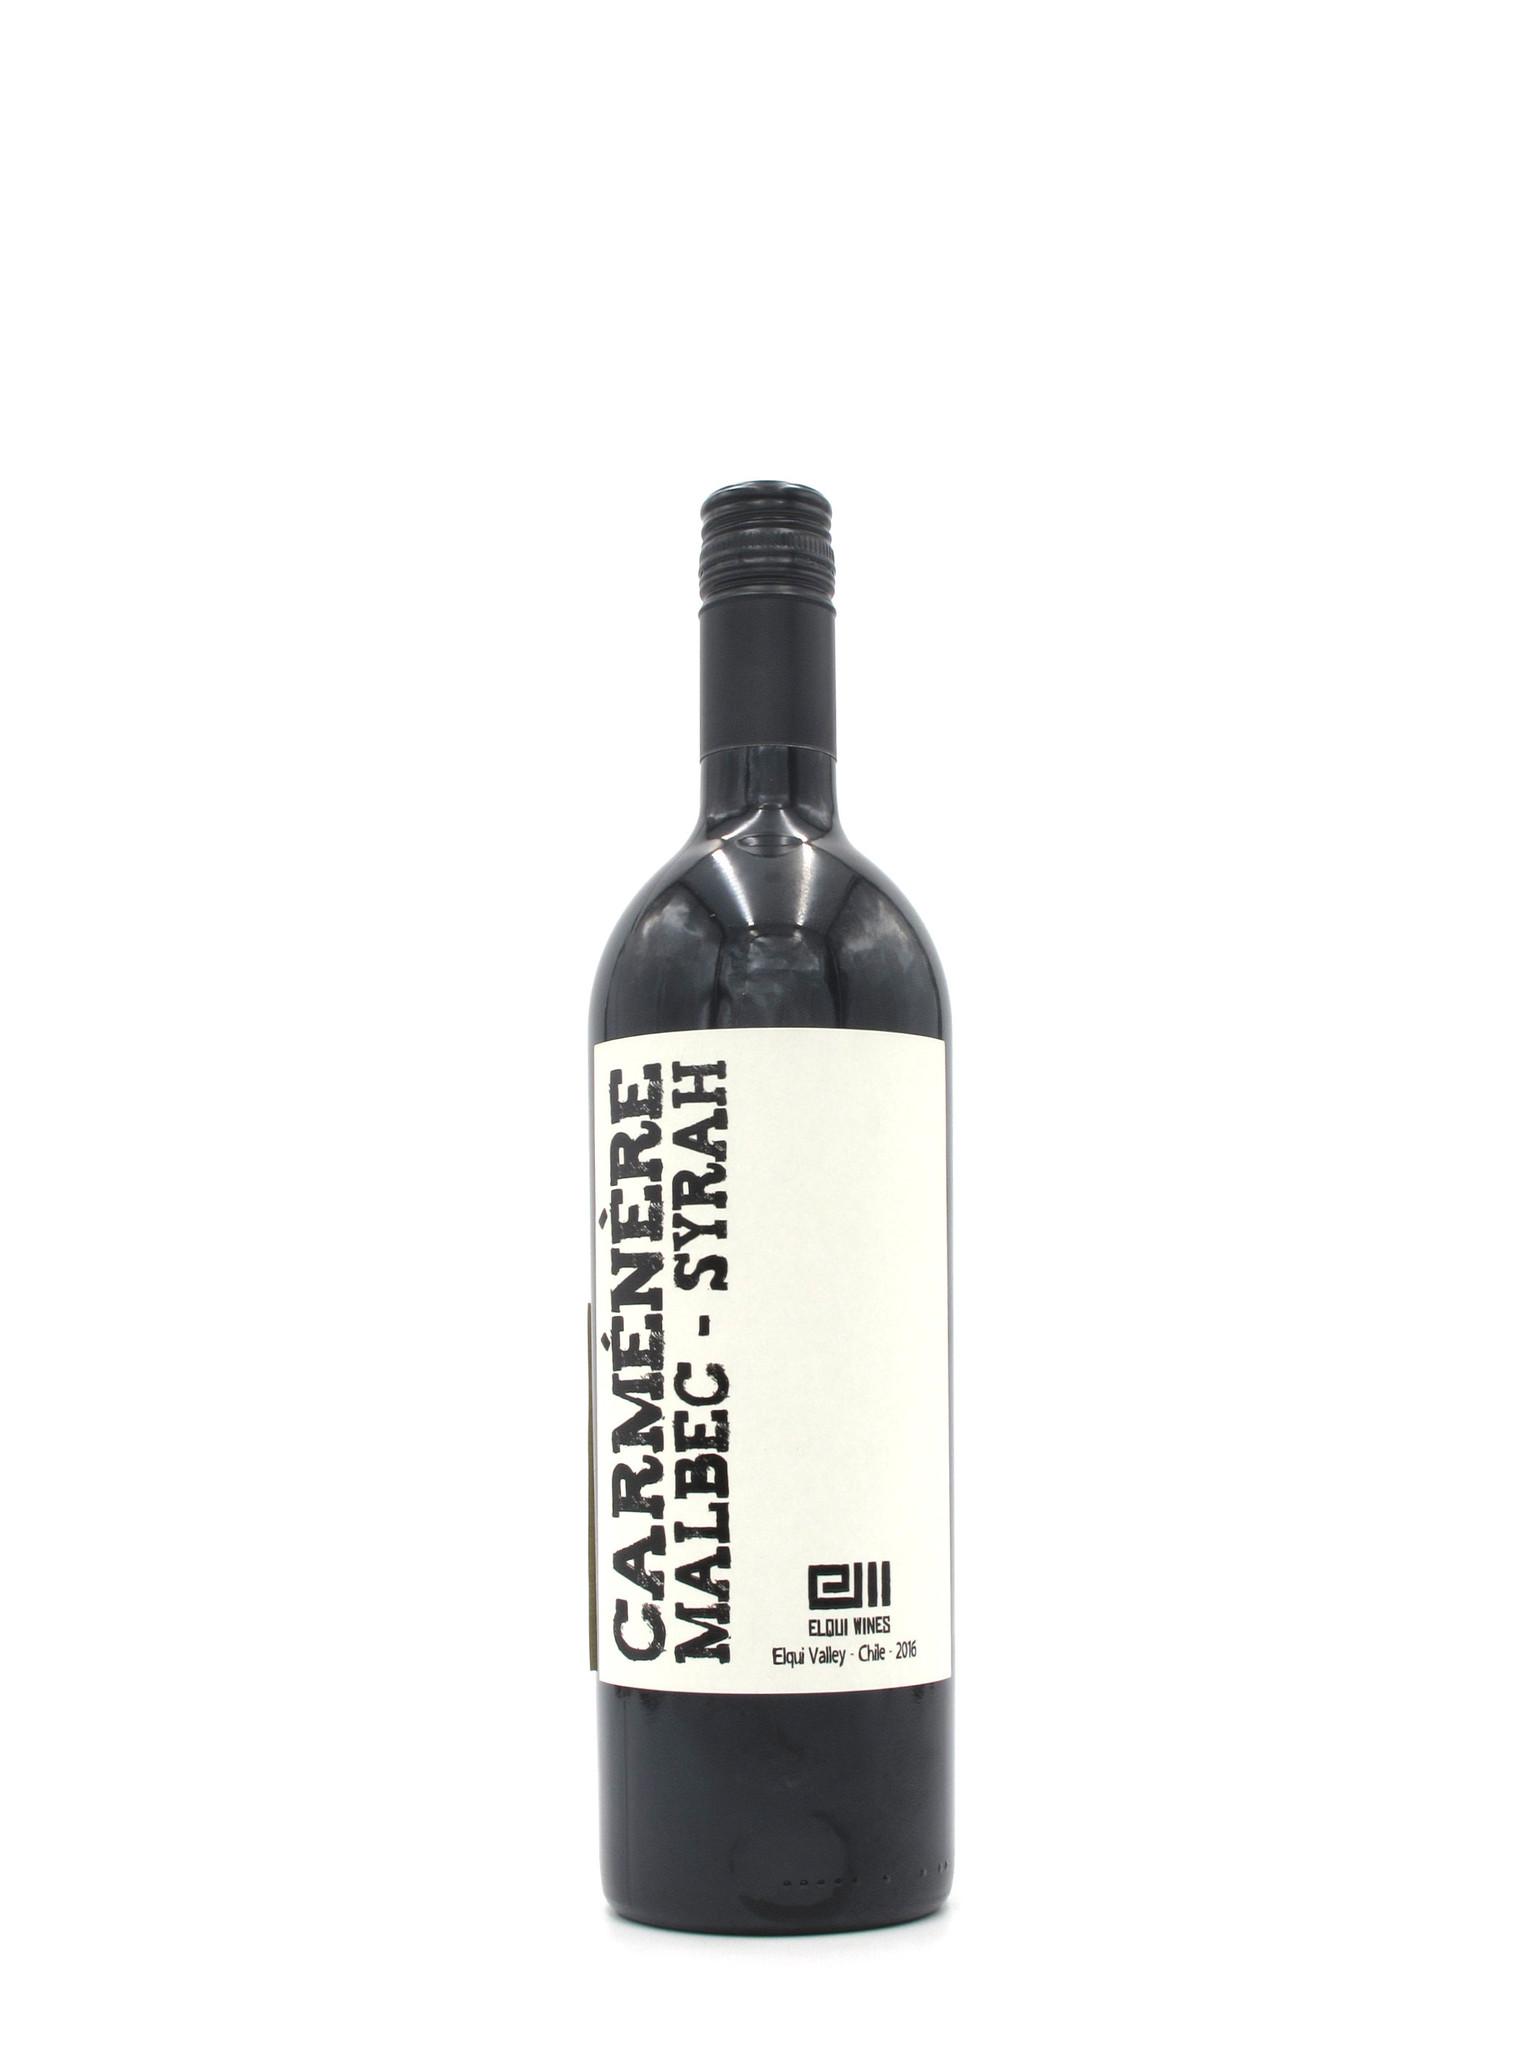 Elqui 2016 Elqui Wines Carménère Syrah Malbec 750ml